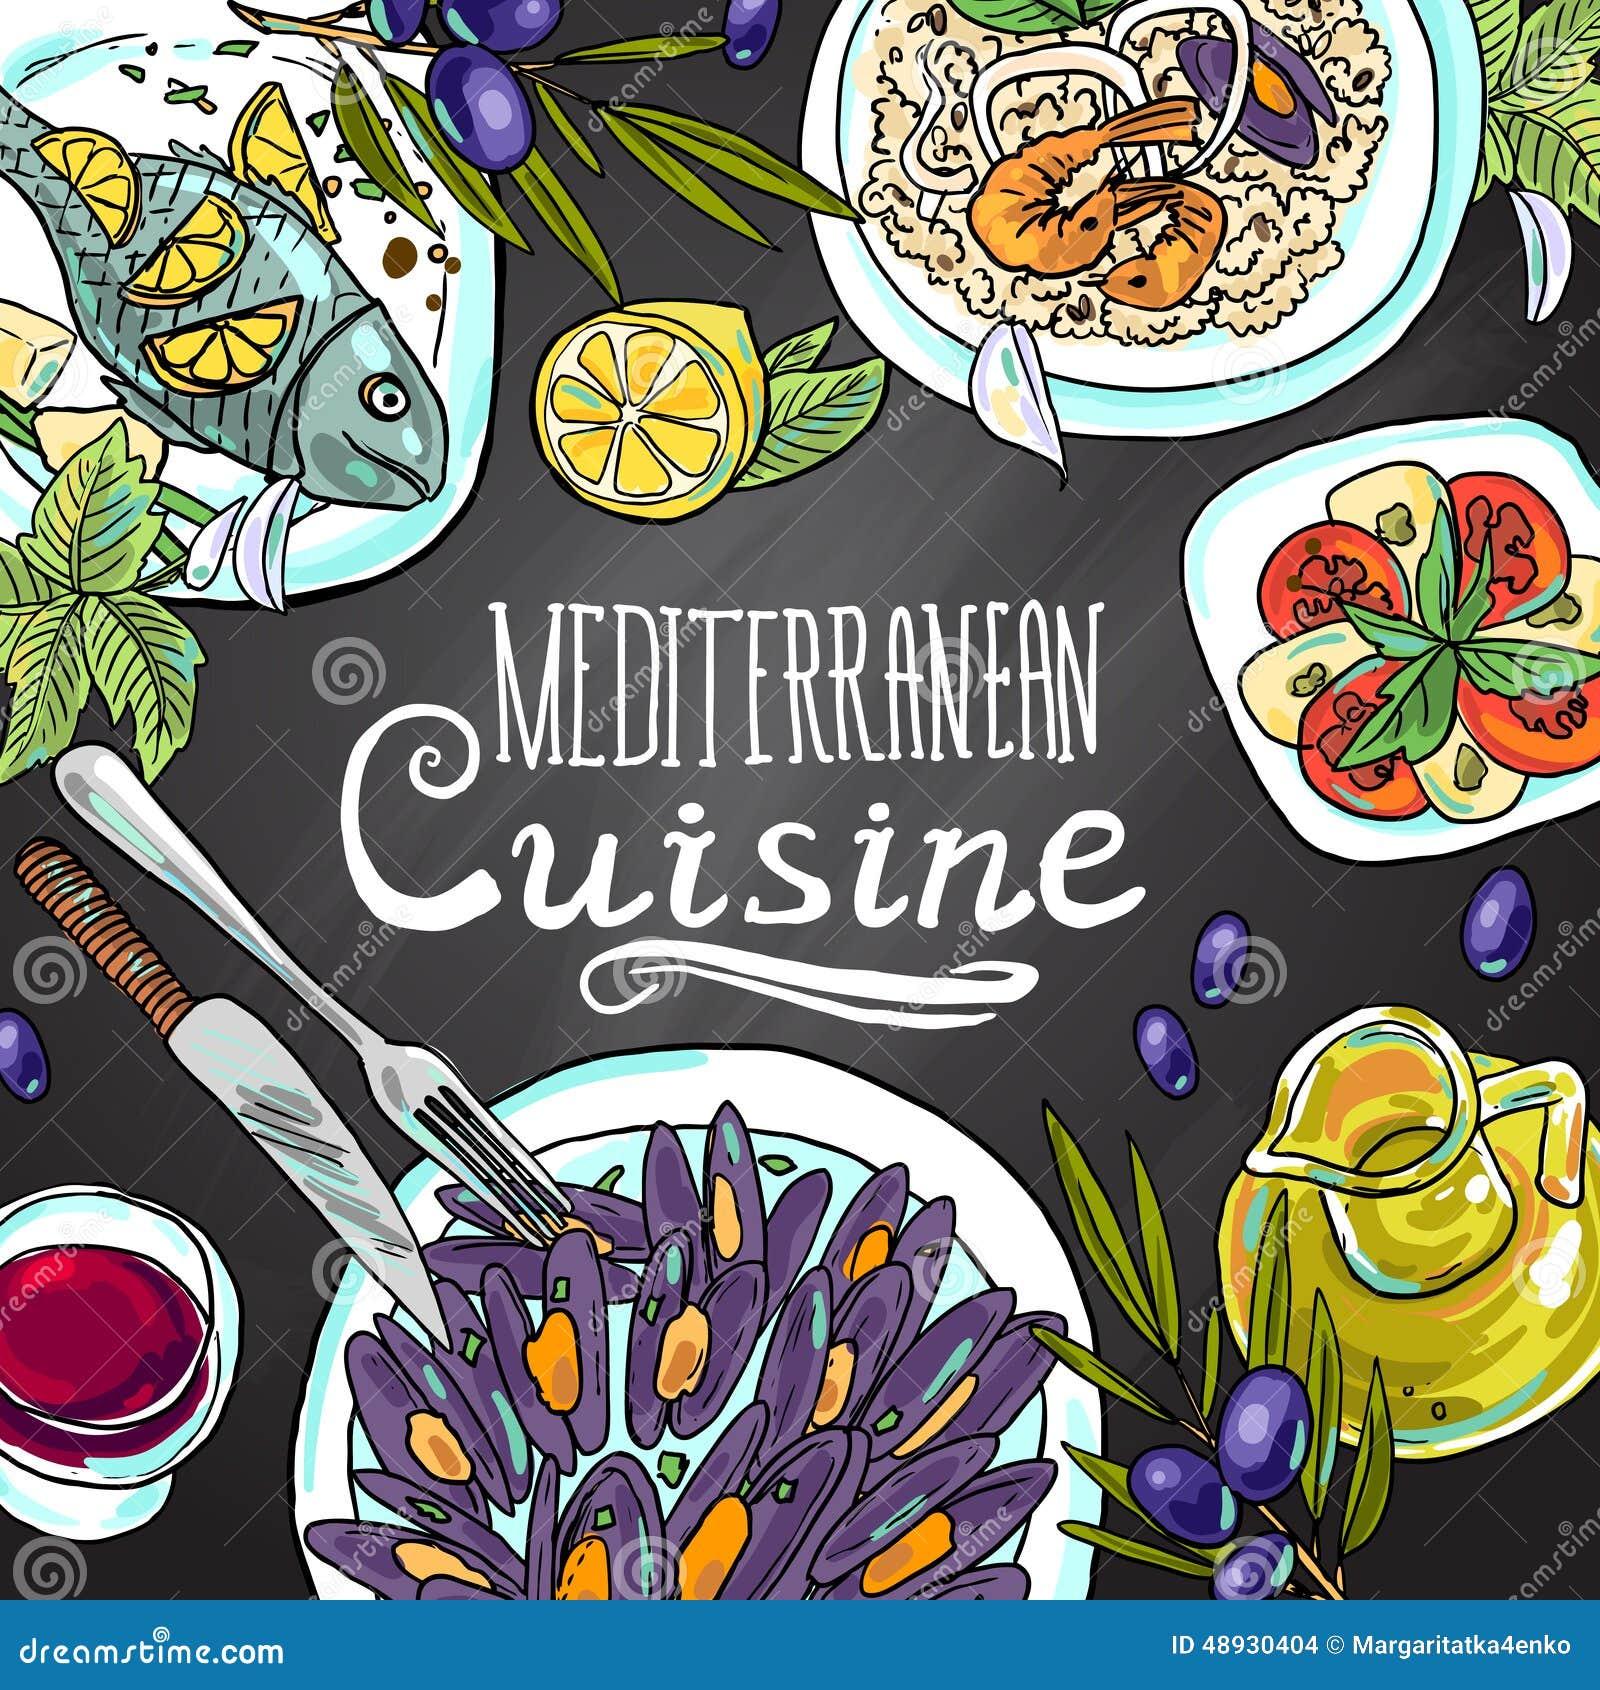 Mediterranean cuisine stock vector image 48930404 for Afghan cuisine sugar land menu